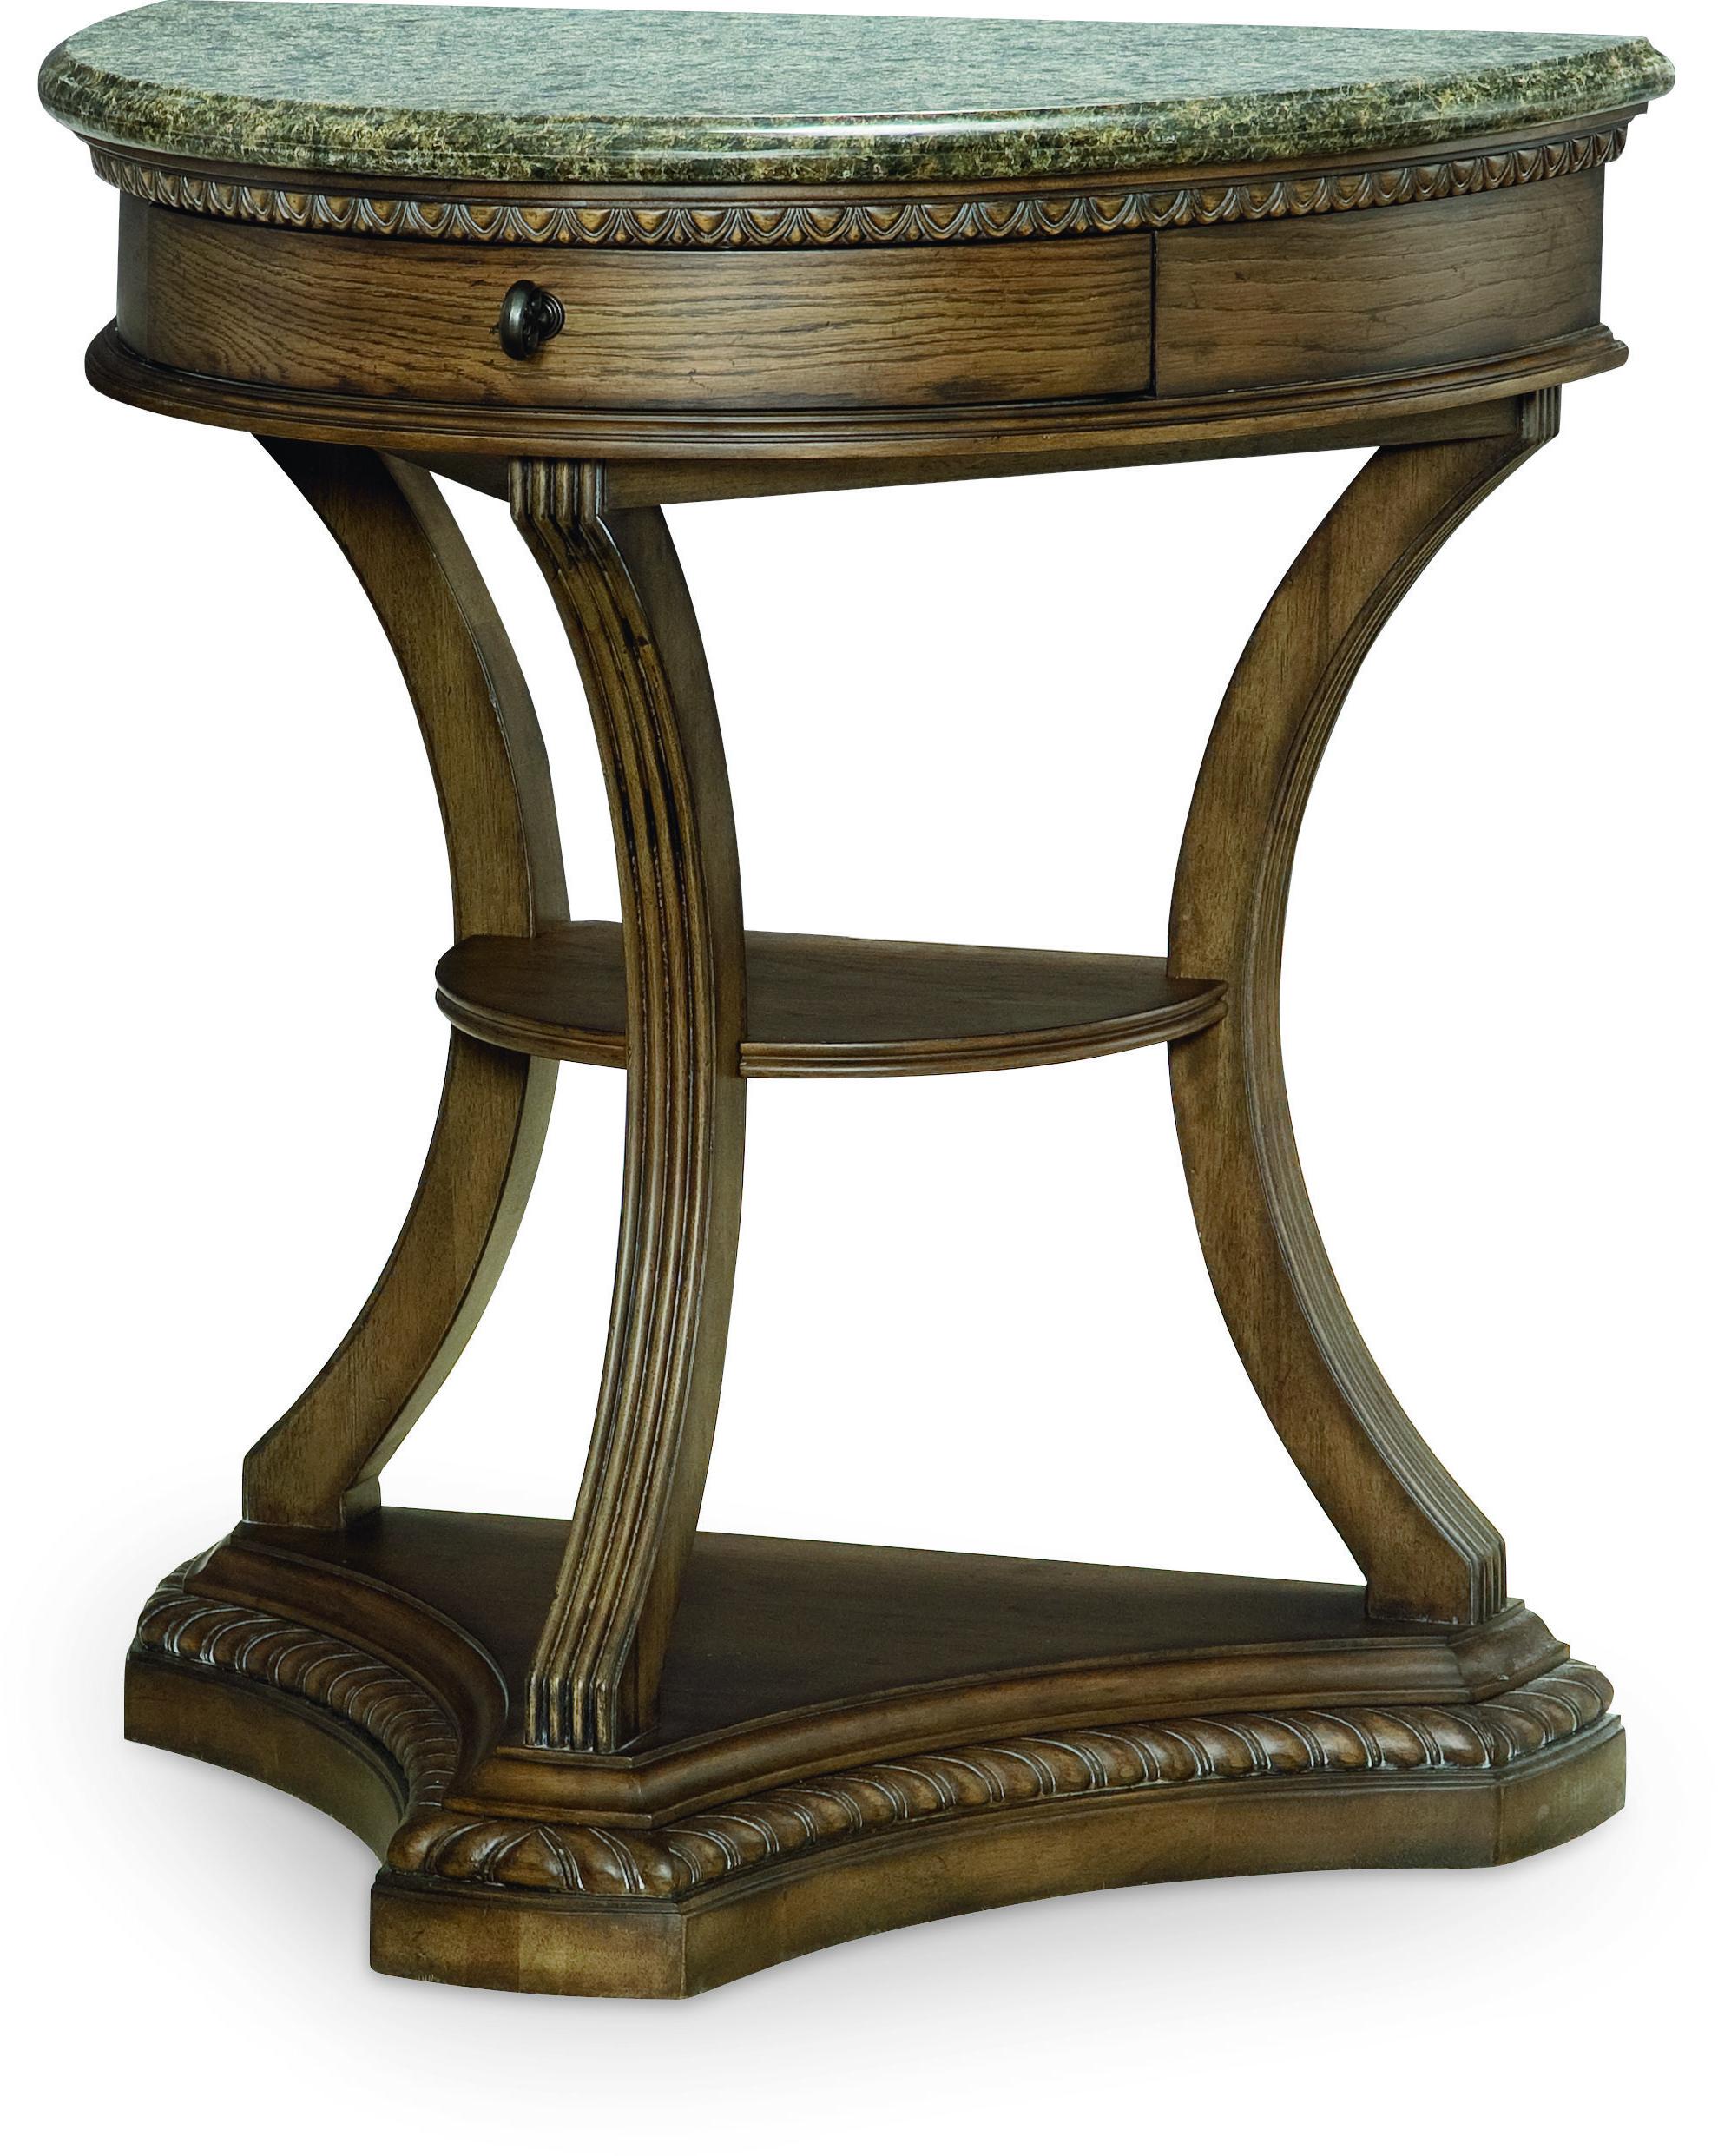 Legacy Classic Renaissance Demilune Bedside Chest  - Item Number: 5500-3200